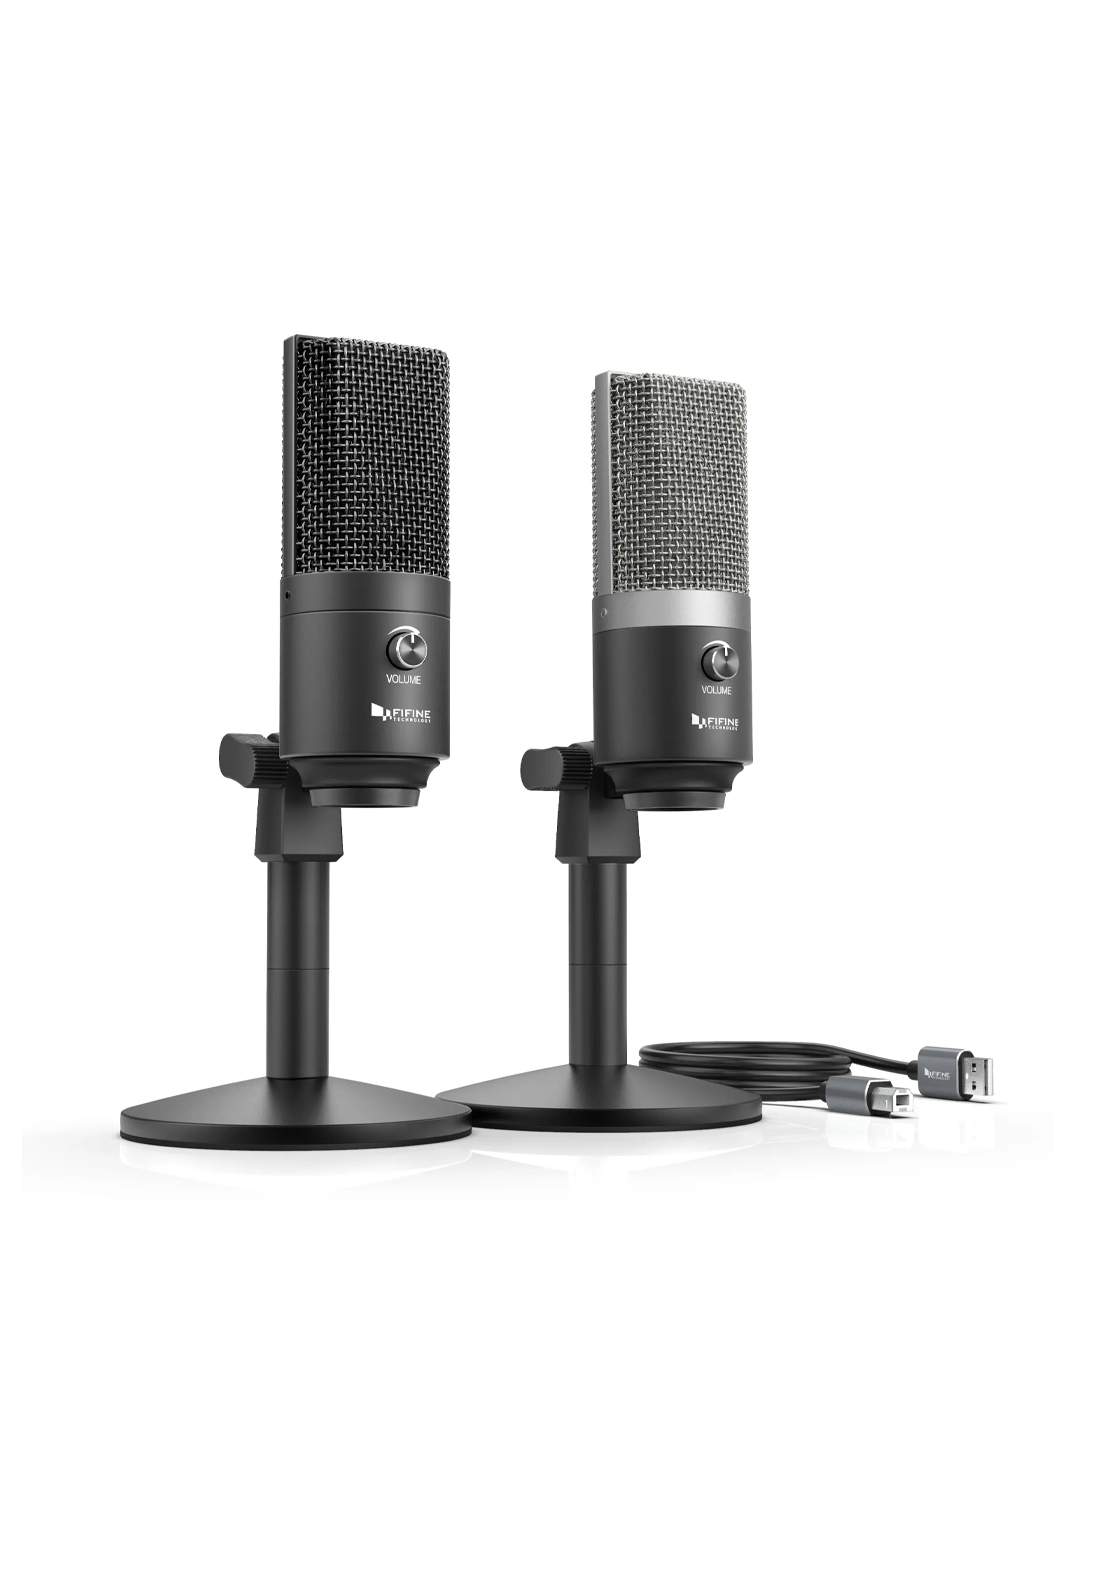 Fifine K670 USB Microphone for PC مايكروفون